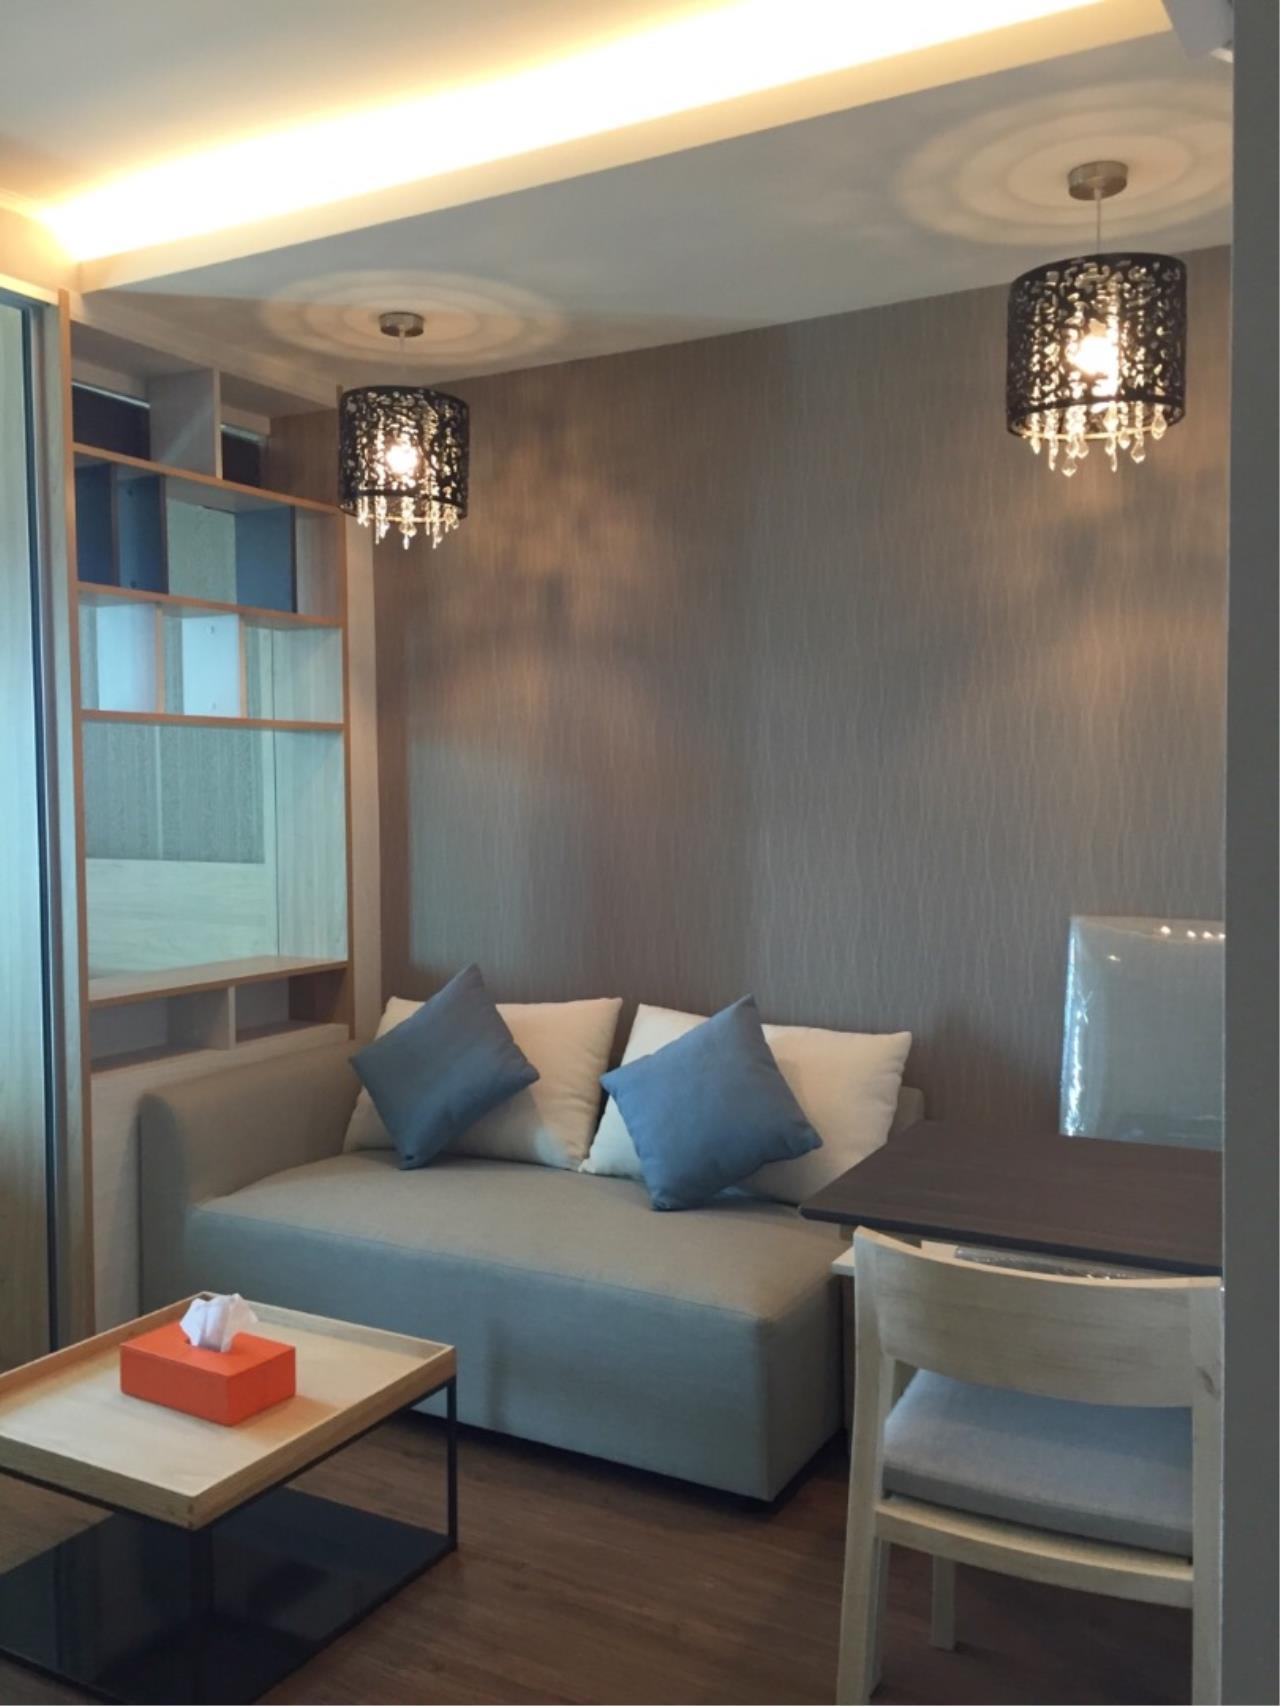 Century21 Skylux Agency's U Delight Residence Riverfront Rama 3 / Condo For Sale / 1 Bedroom / 35 SQM / BTS Saphan Taksin / Bangkok 3